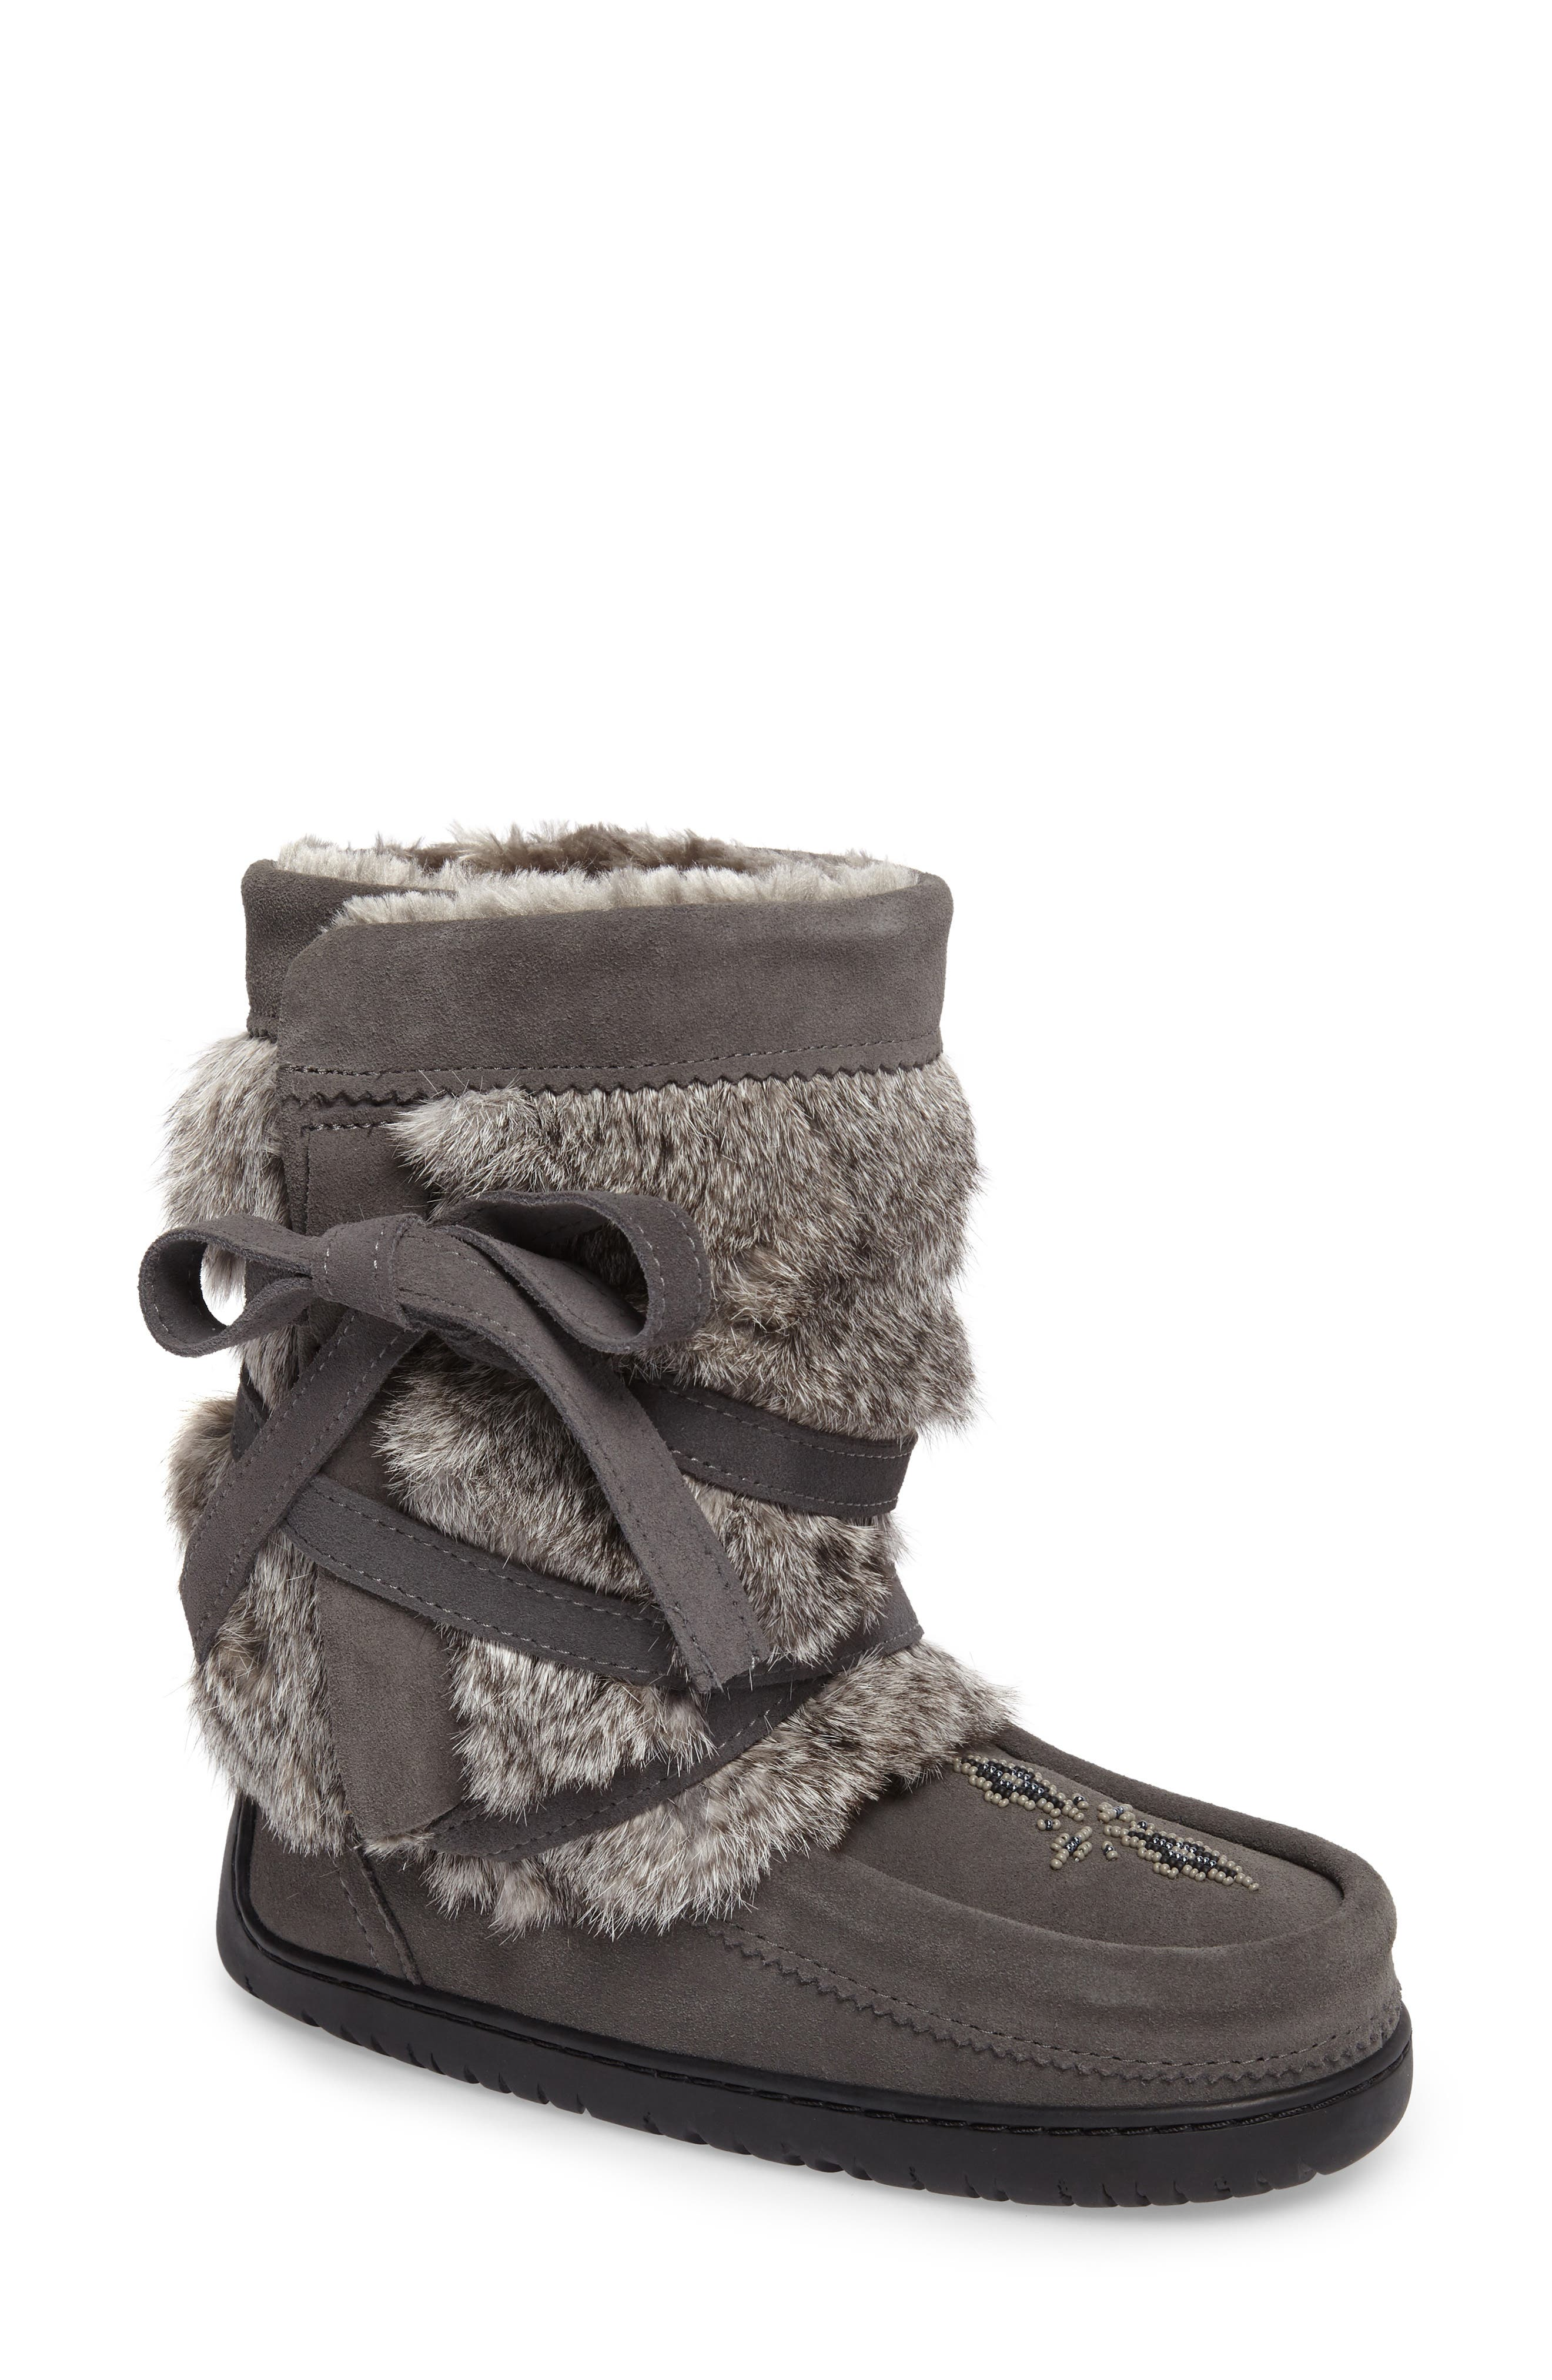 Beaded Short Wrap Genuine Rabbit Fur & Shearling Boot,                             Main thumbnail 1, color,                             CHARCOAL FUR